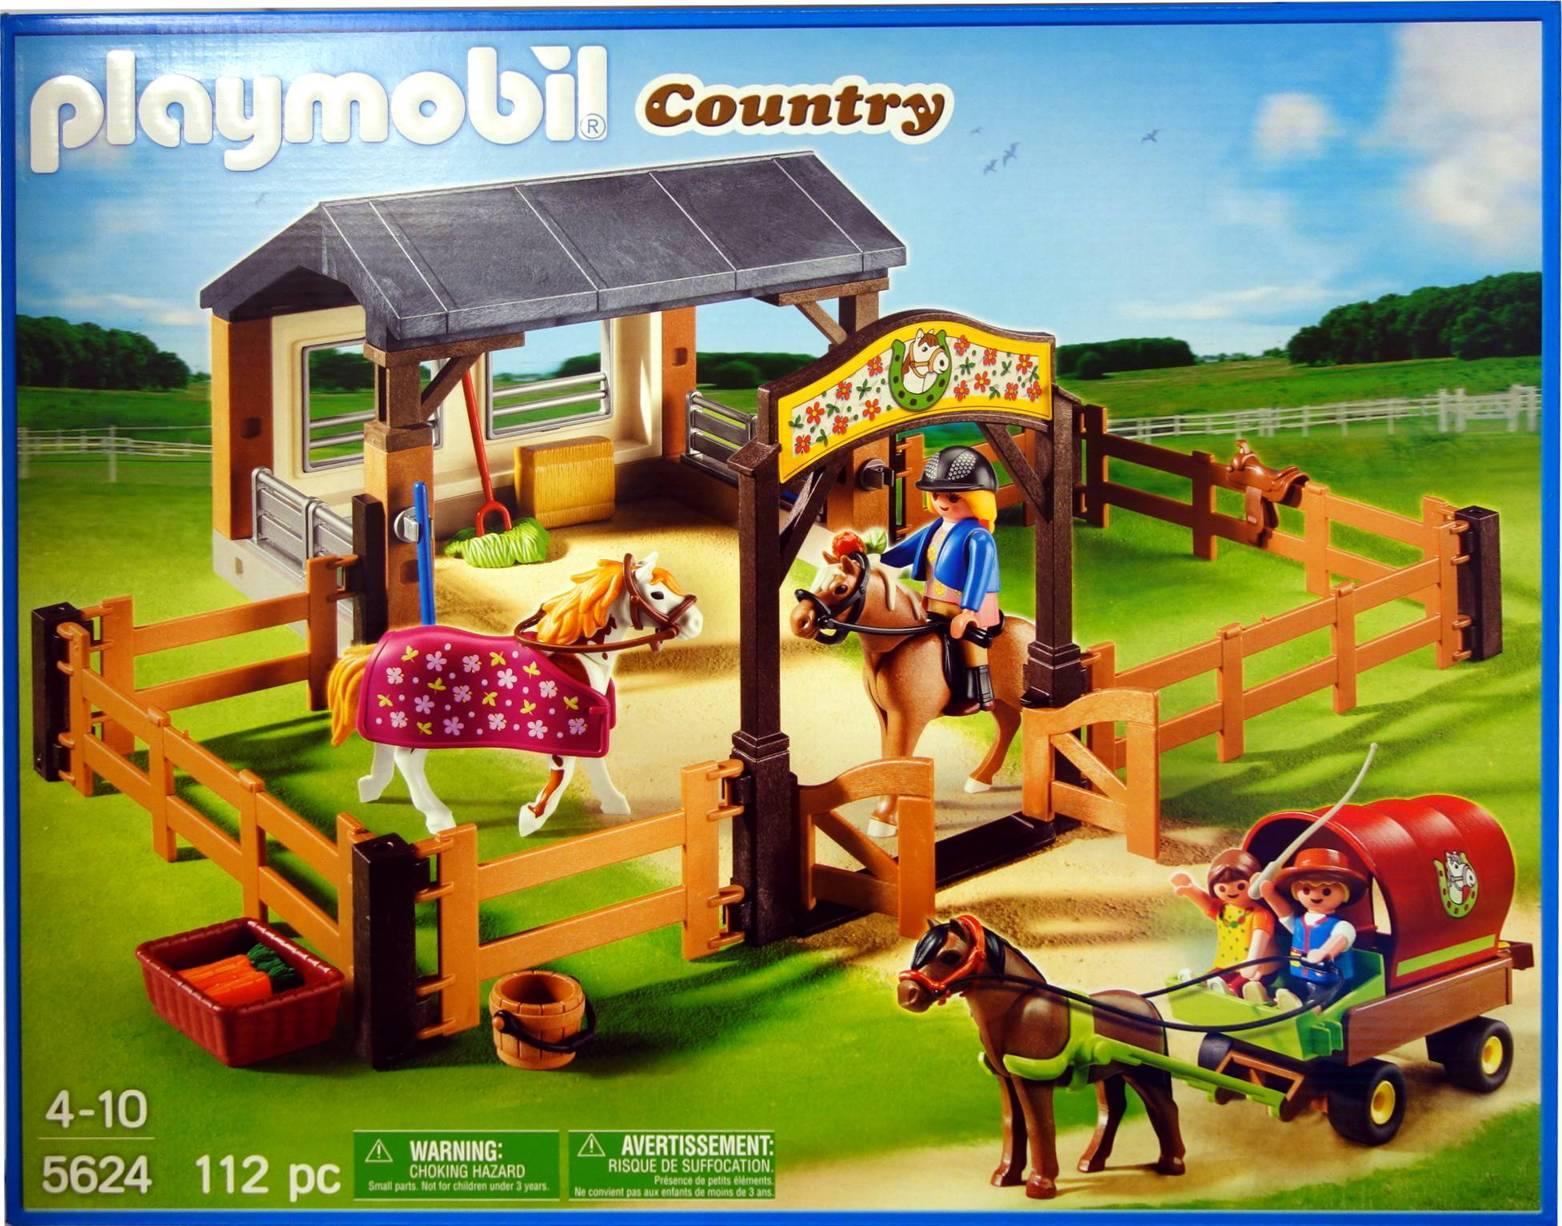 5624 caballos granja set de playmobil country nuevo ebay for Playmobil pferde set